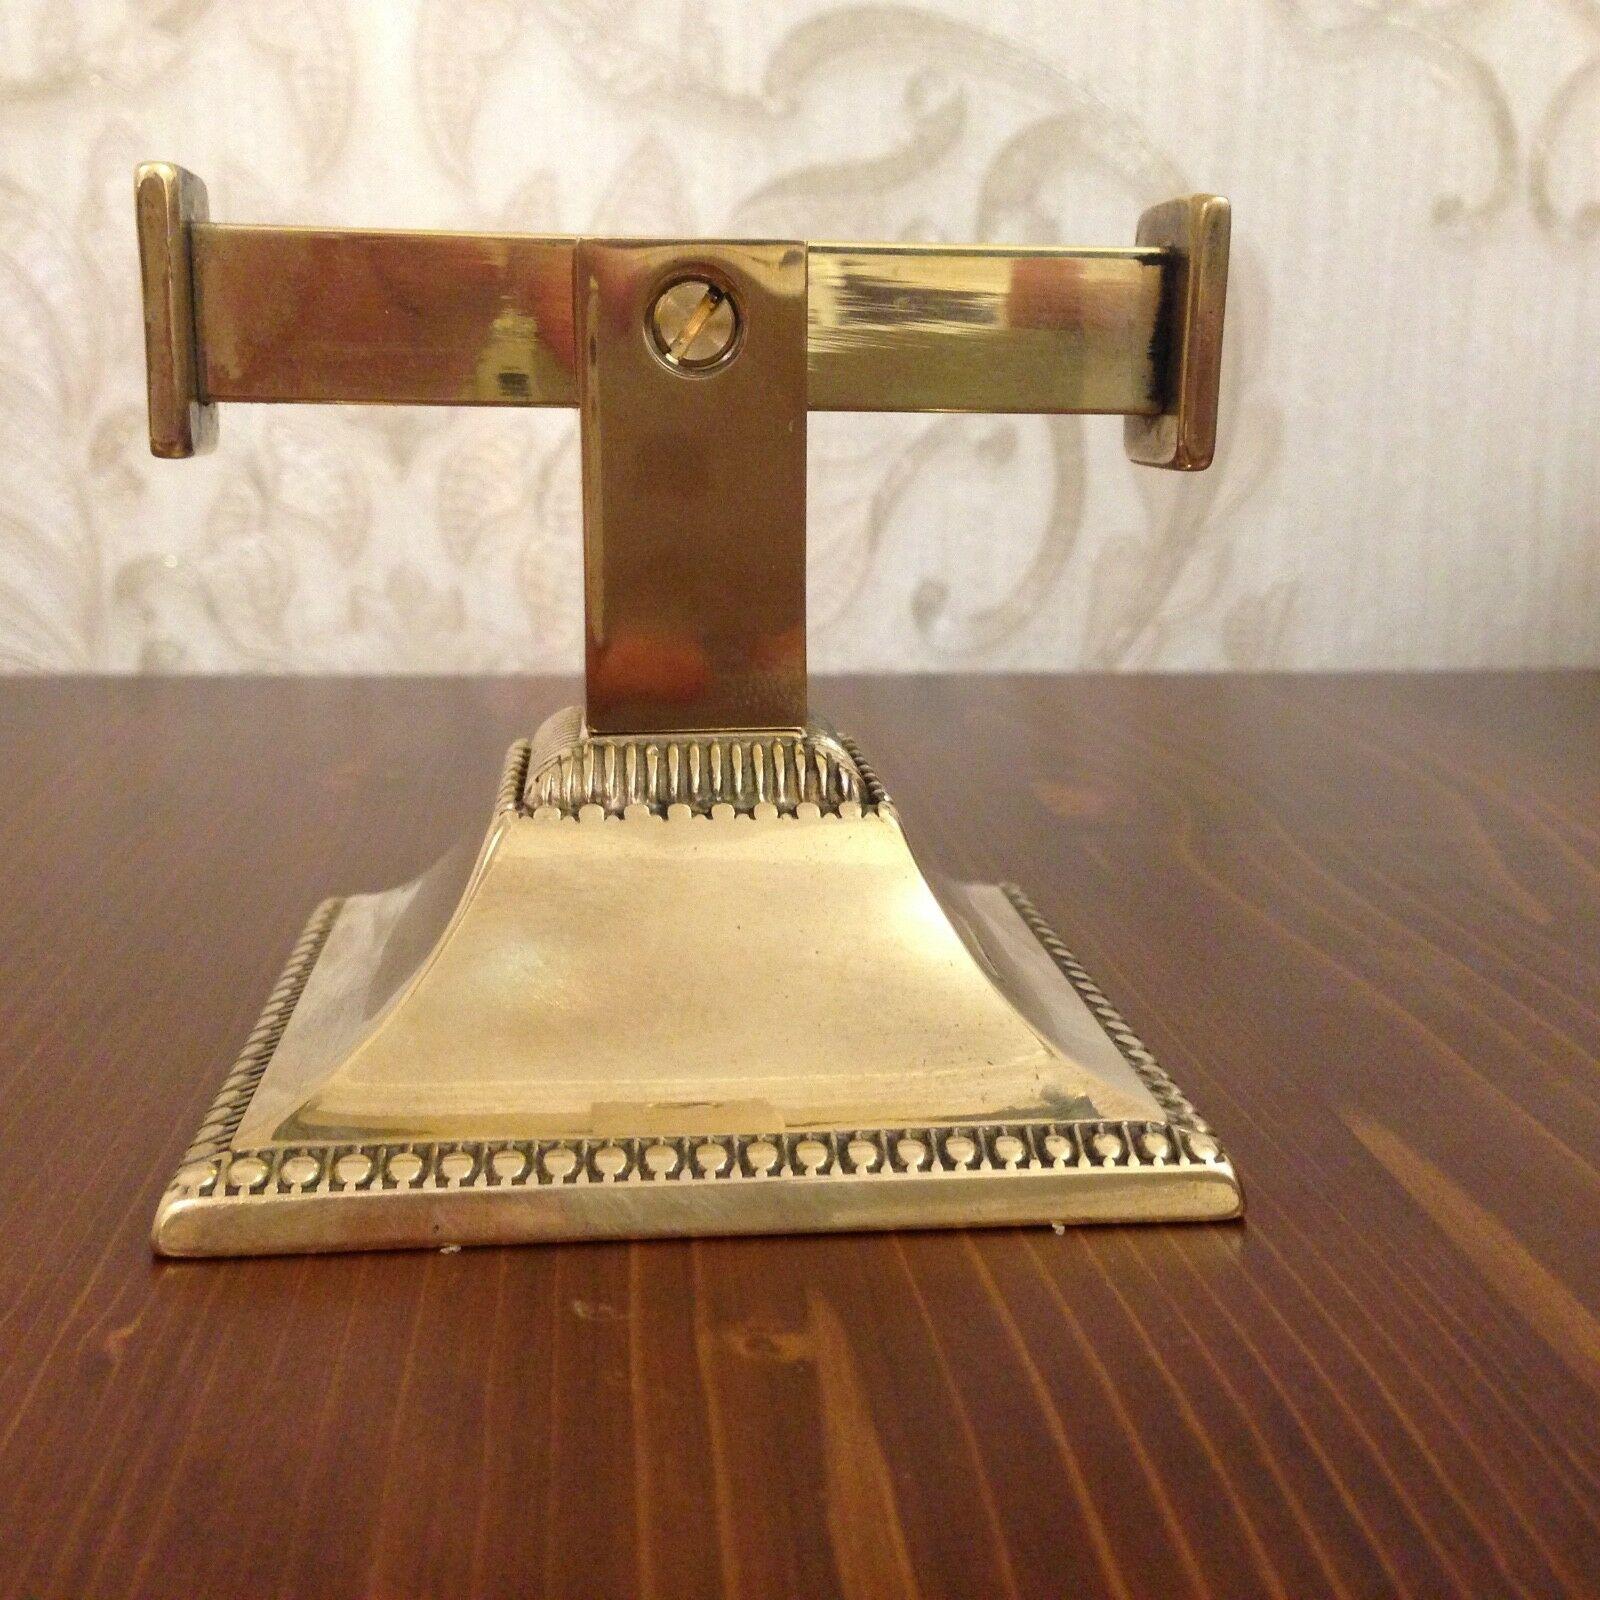 Handtuchhalter gold Messing Barock Badezimmer Set Wc Toilette Bad ...